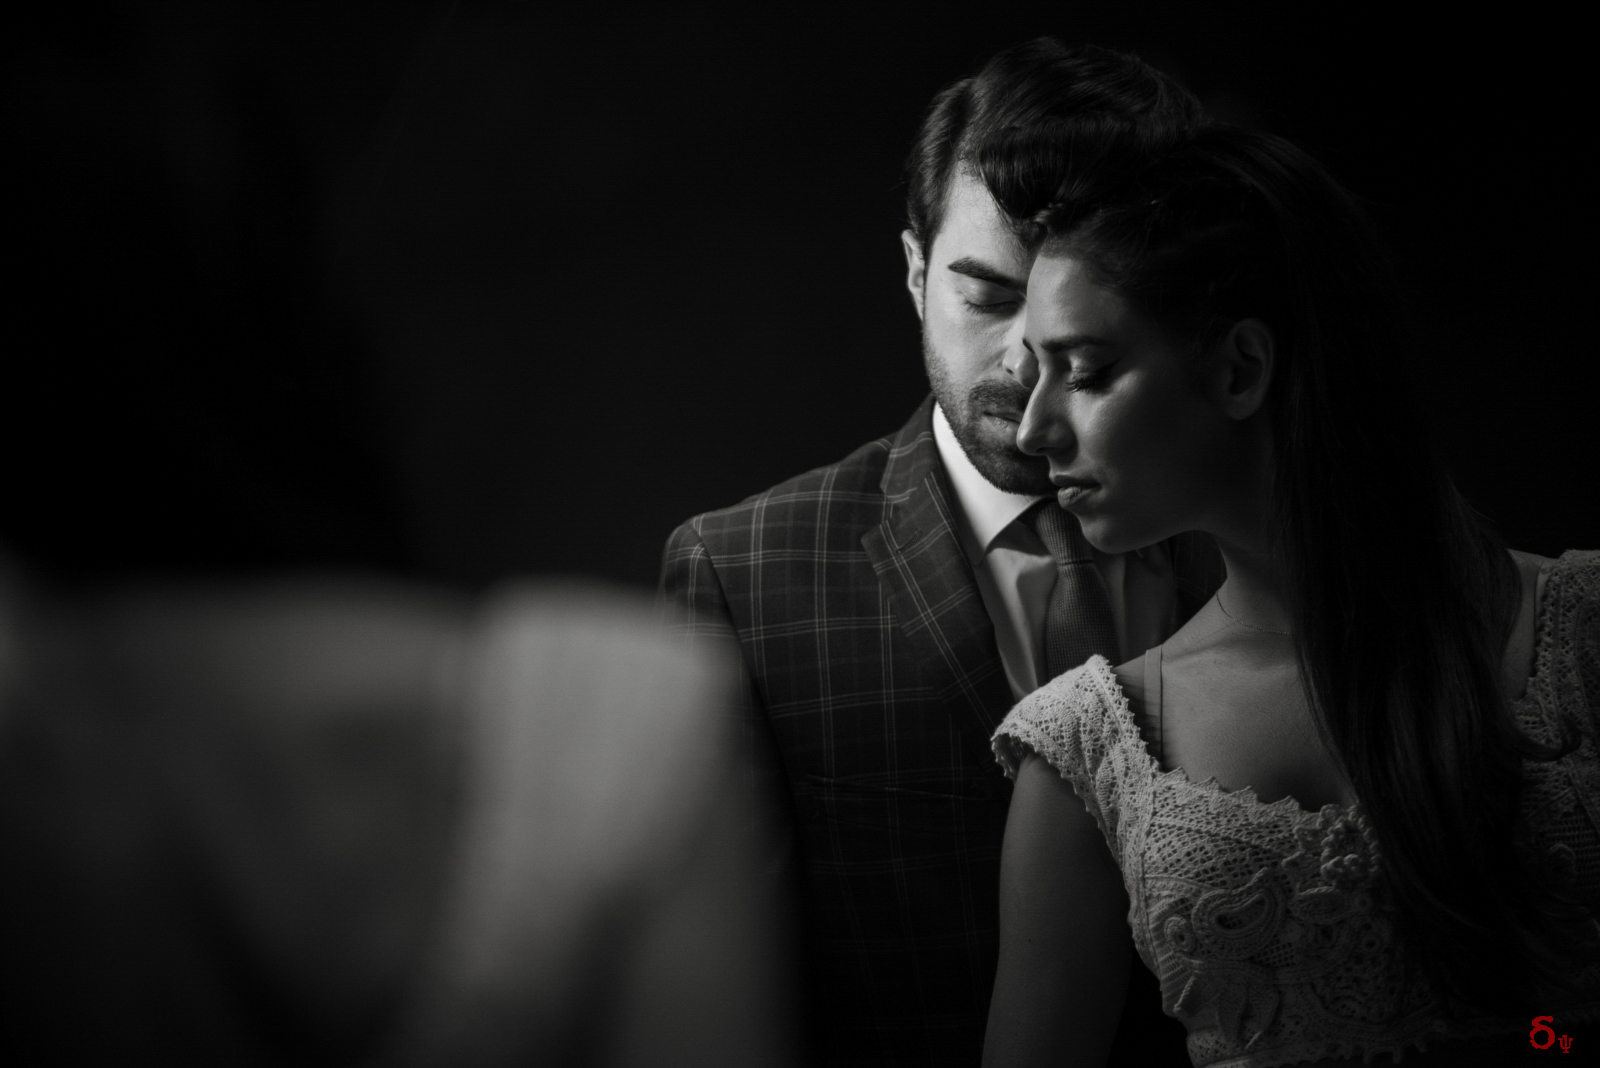 bw  wedding  black and white love couple vows photographer wedding photoshooting